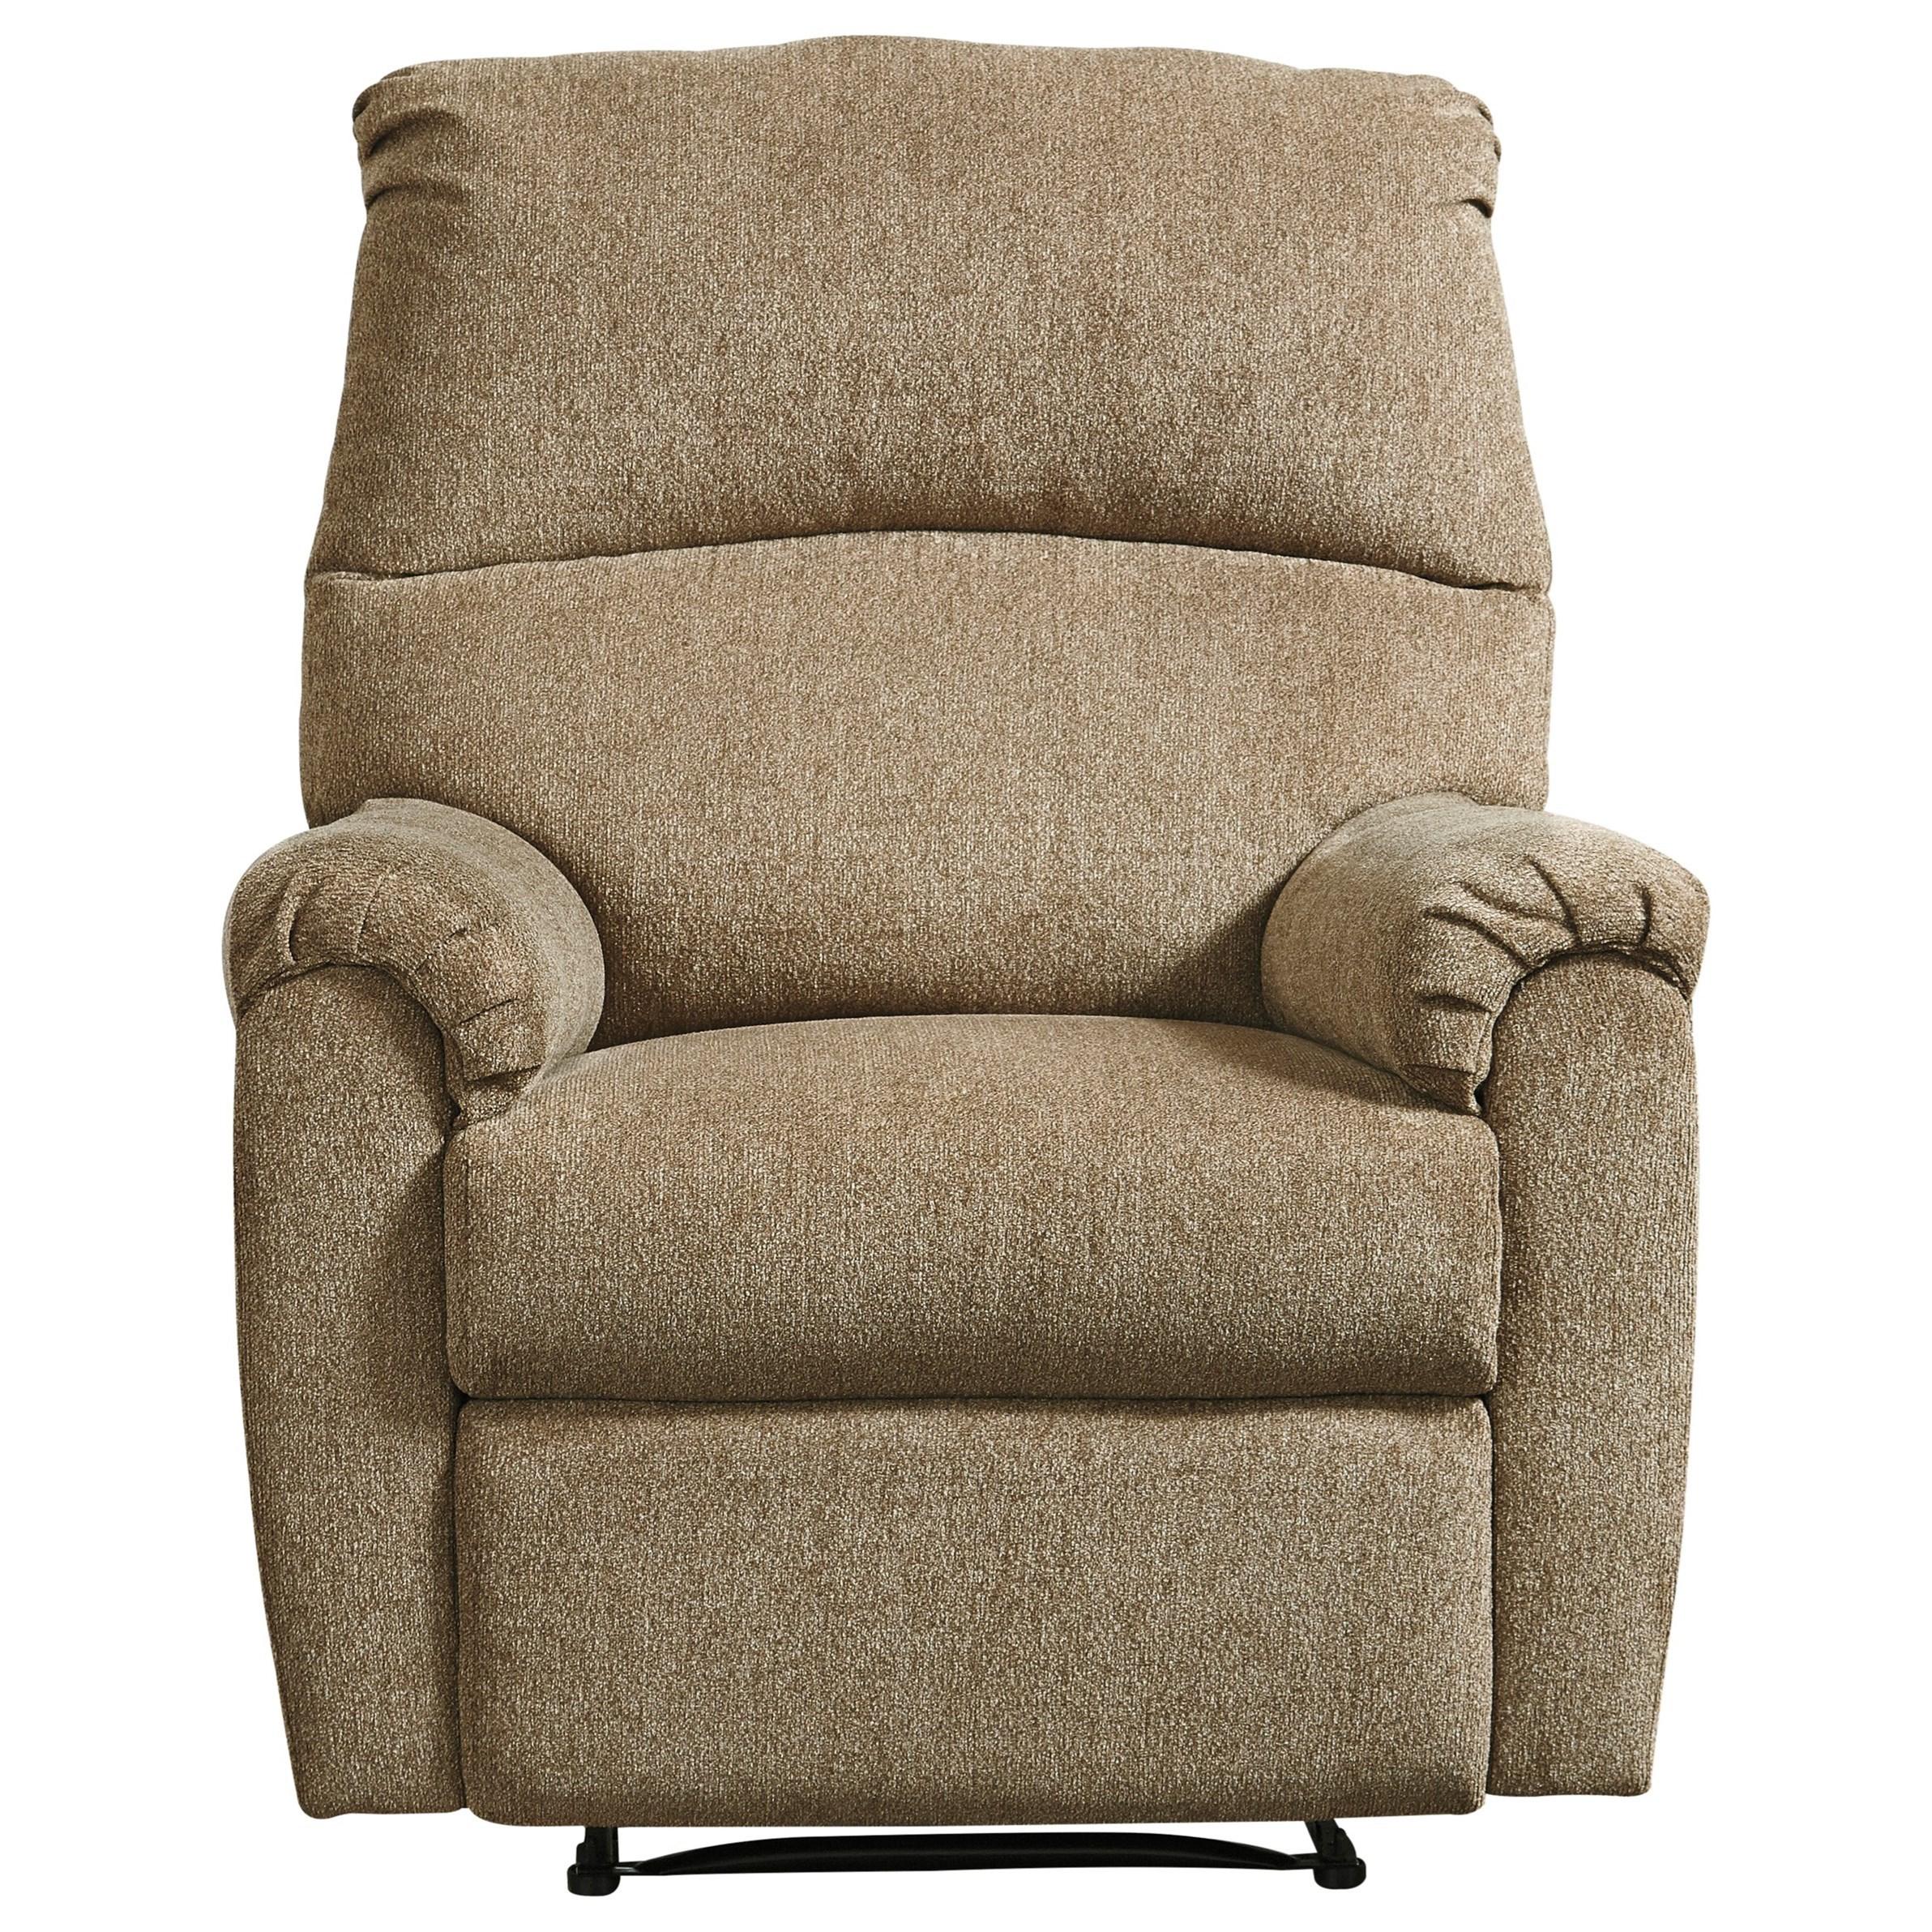 Ashley Furniture Manufacturer: Signature Design By Ashley Nerviano Zero Wall Recliner